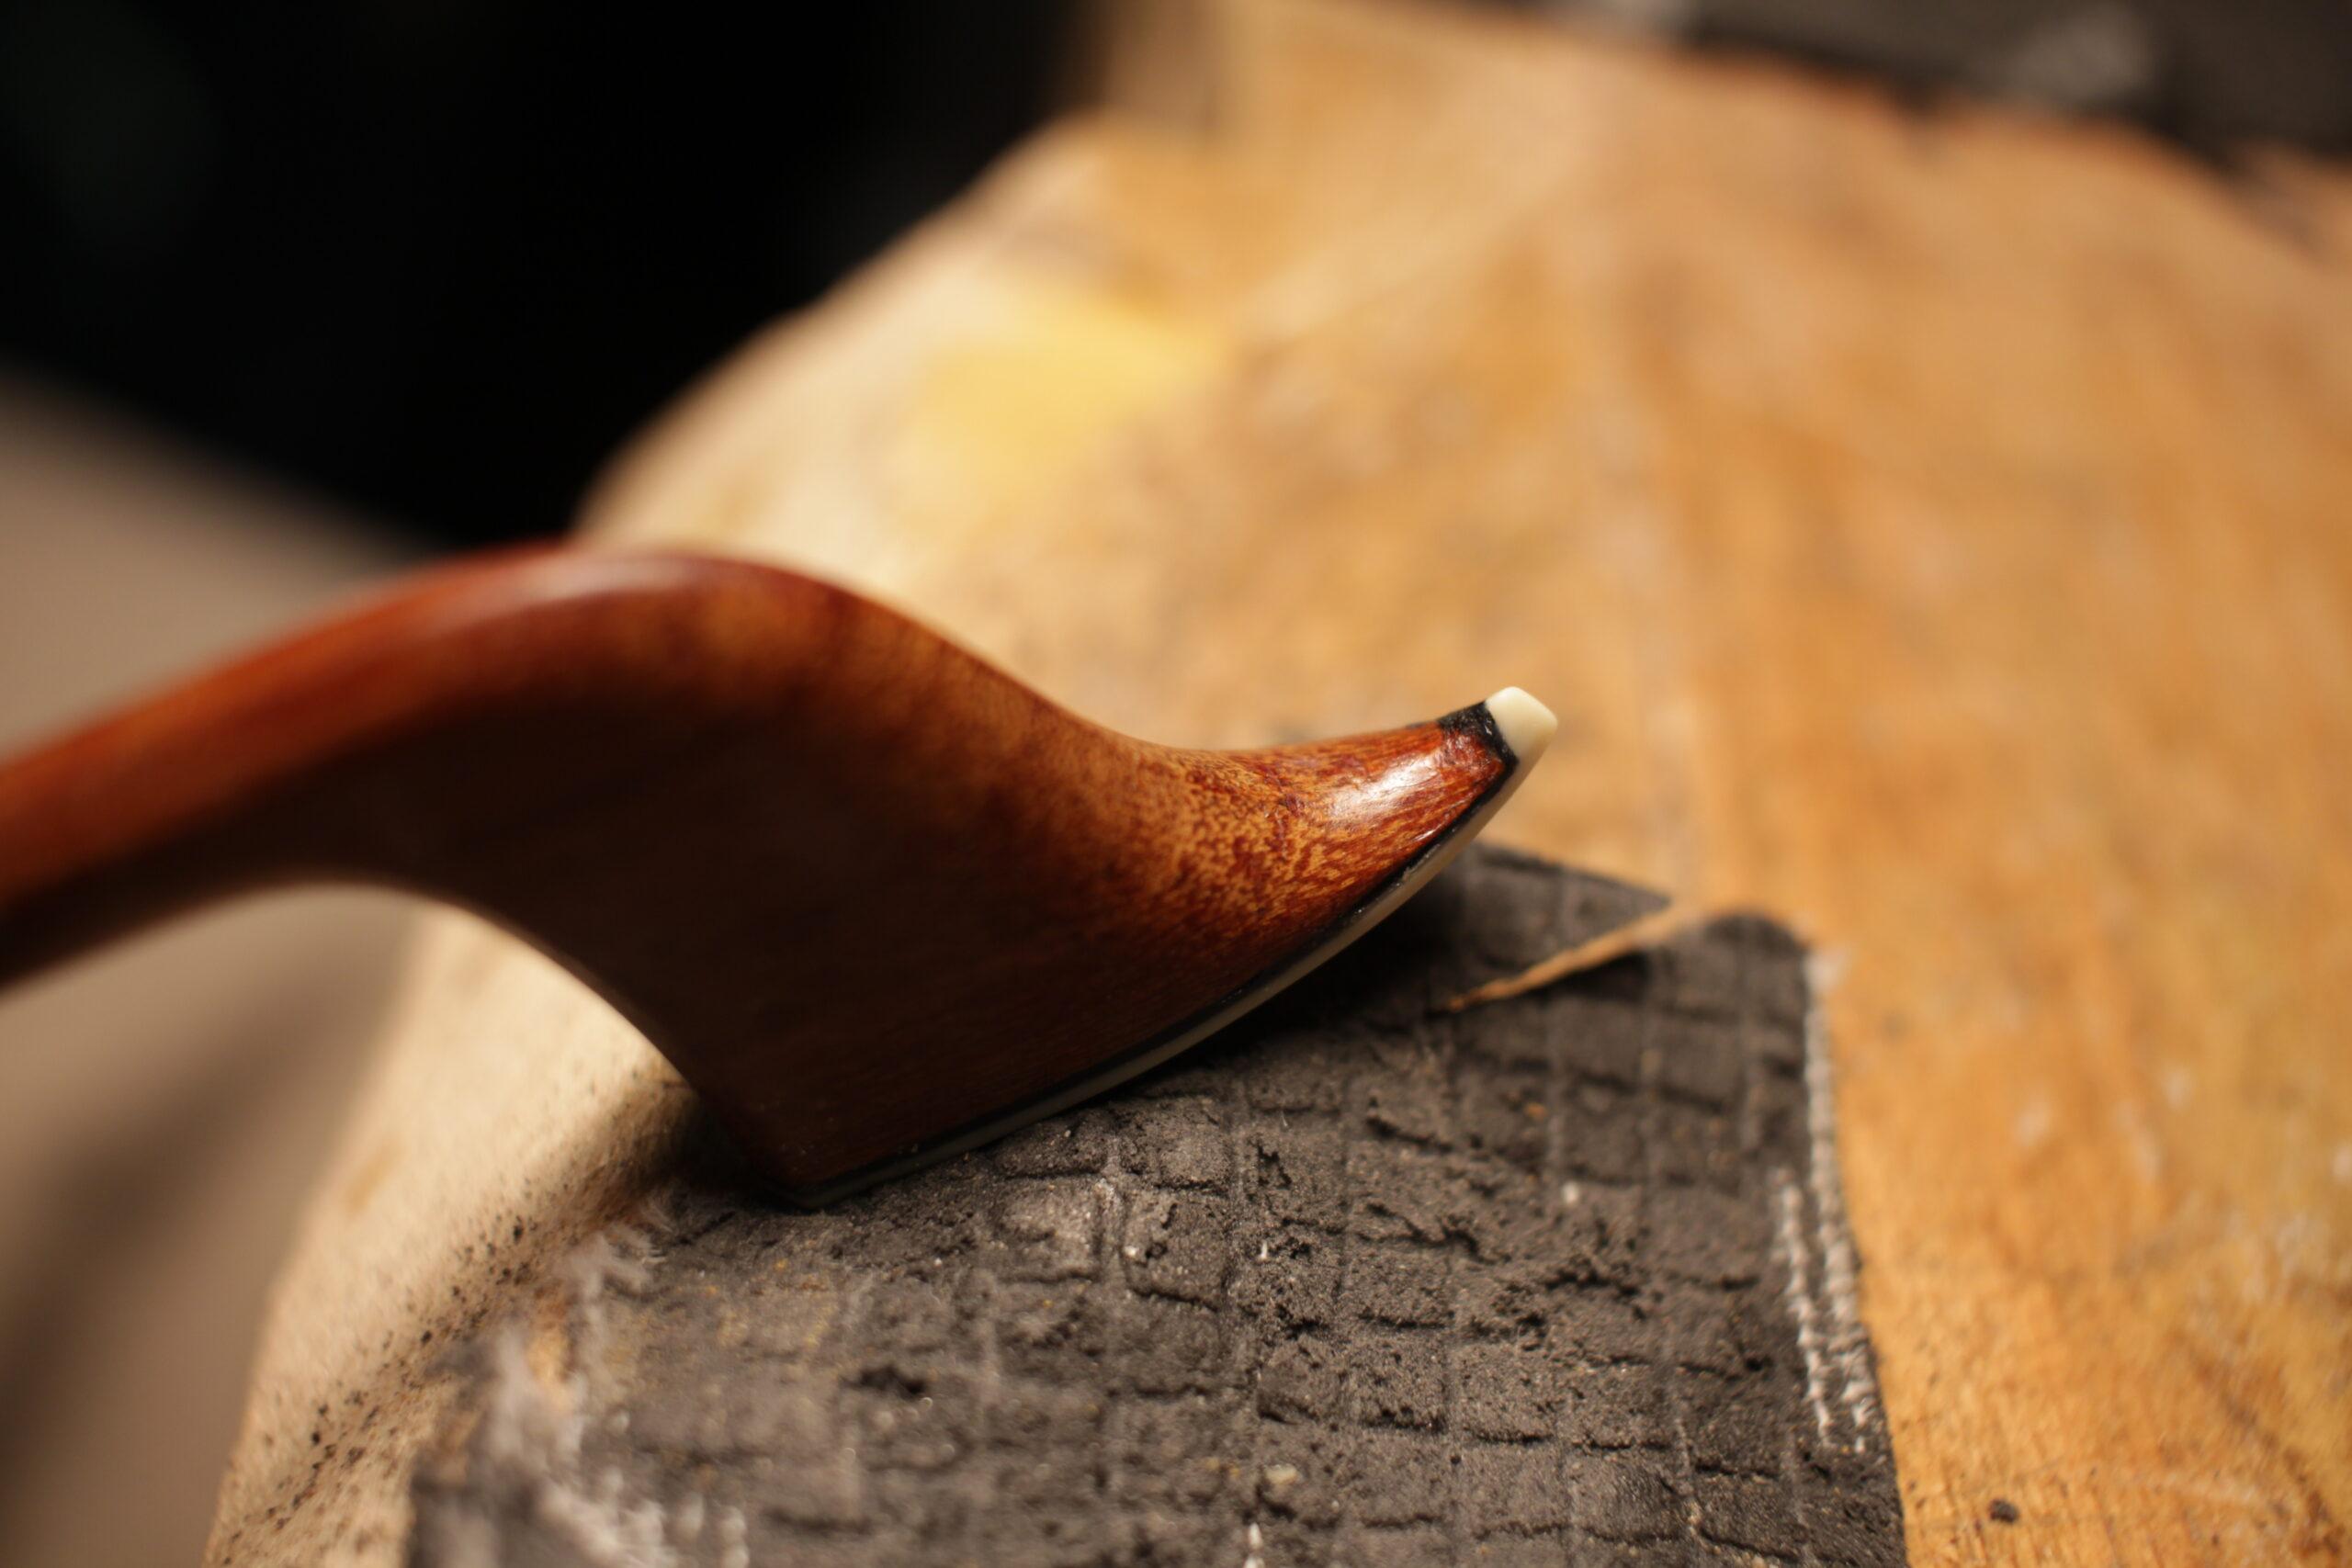 Violin Bow's tip restoration 2